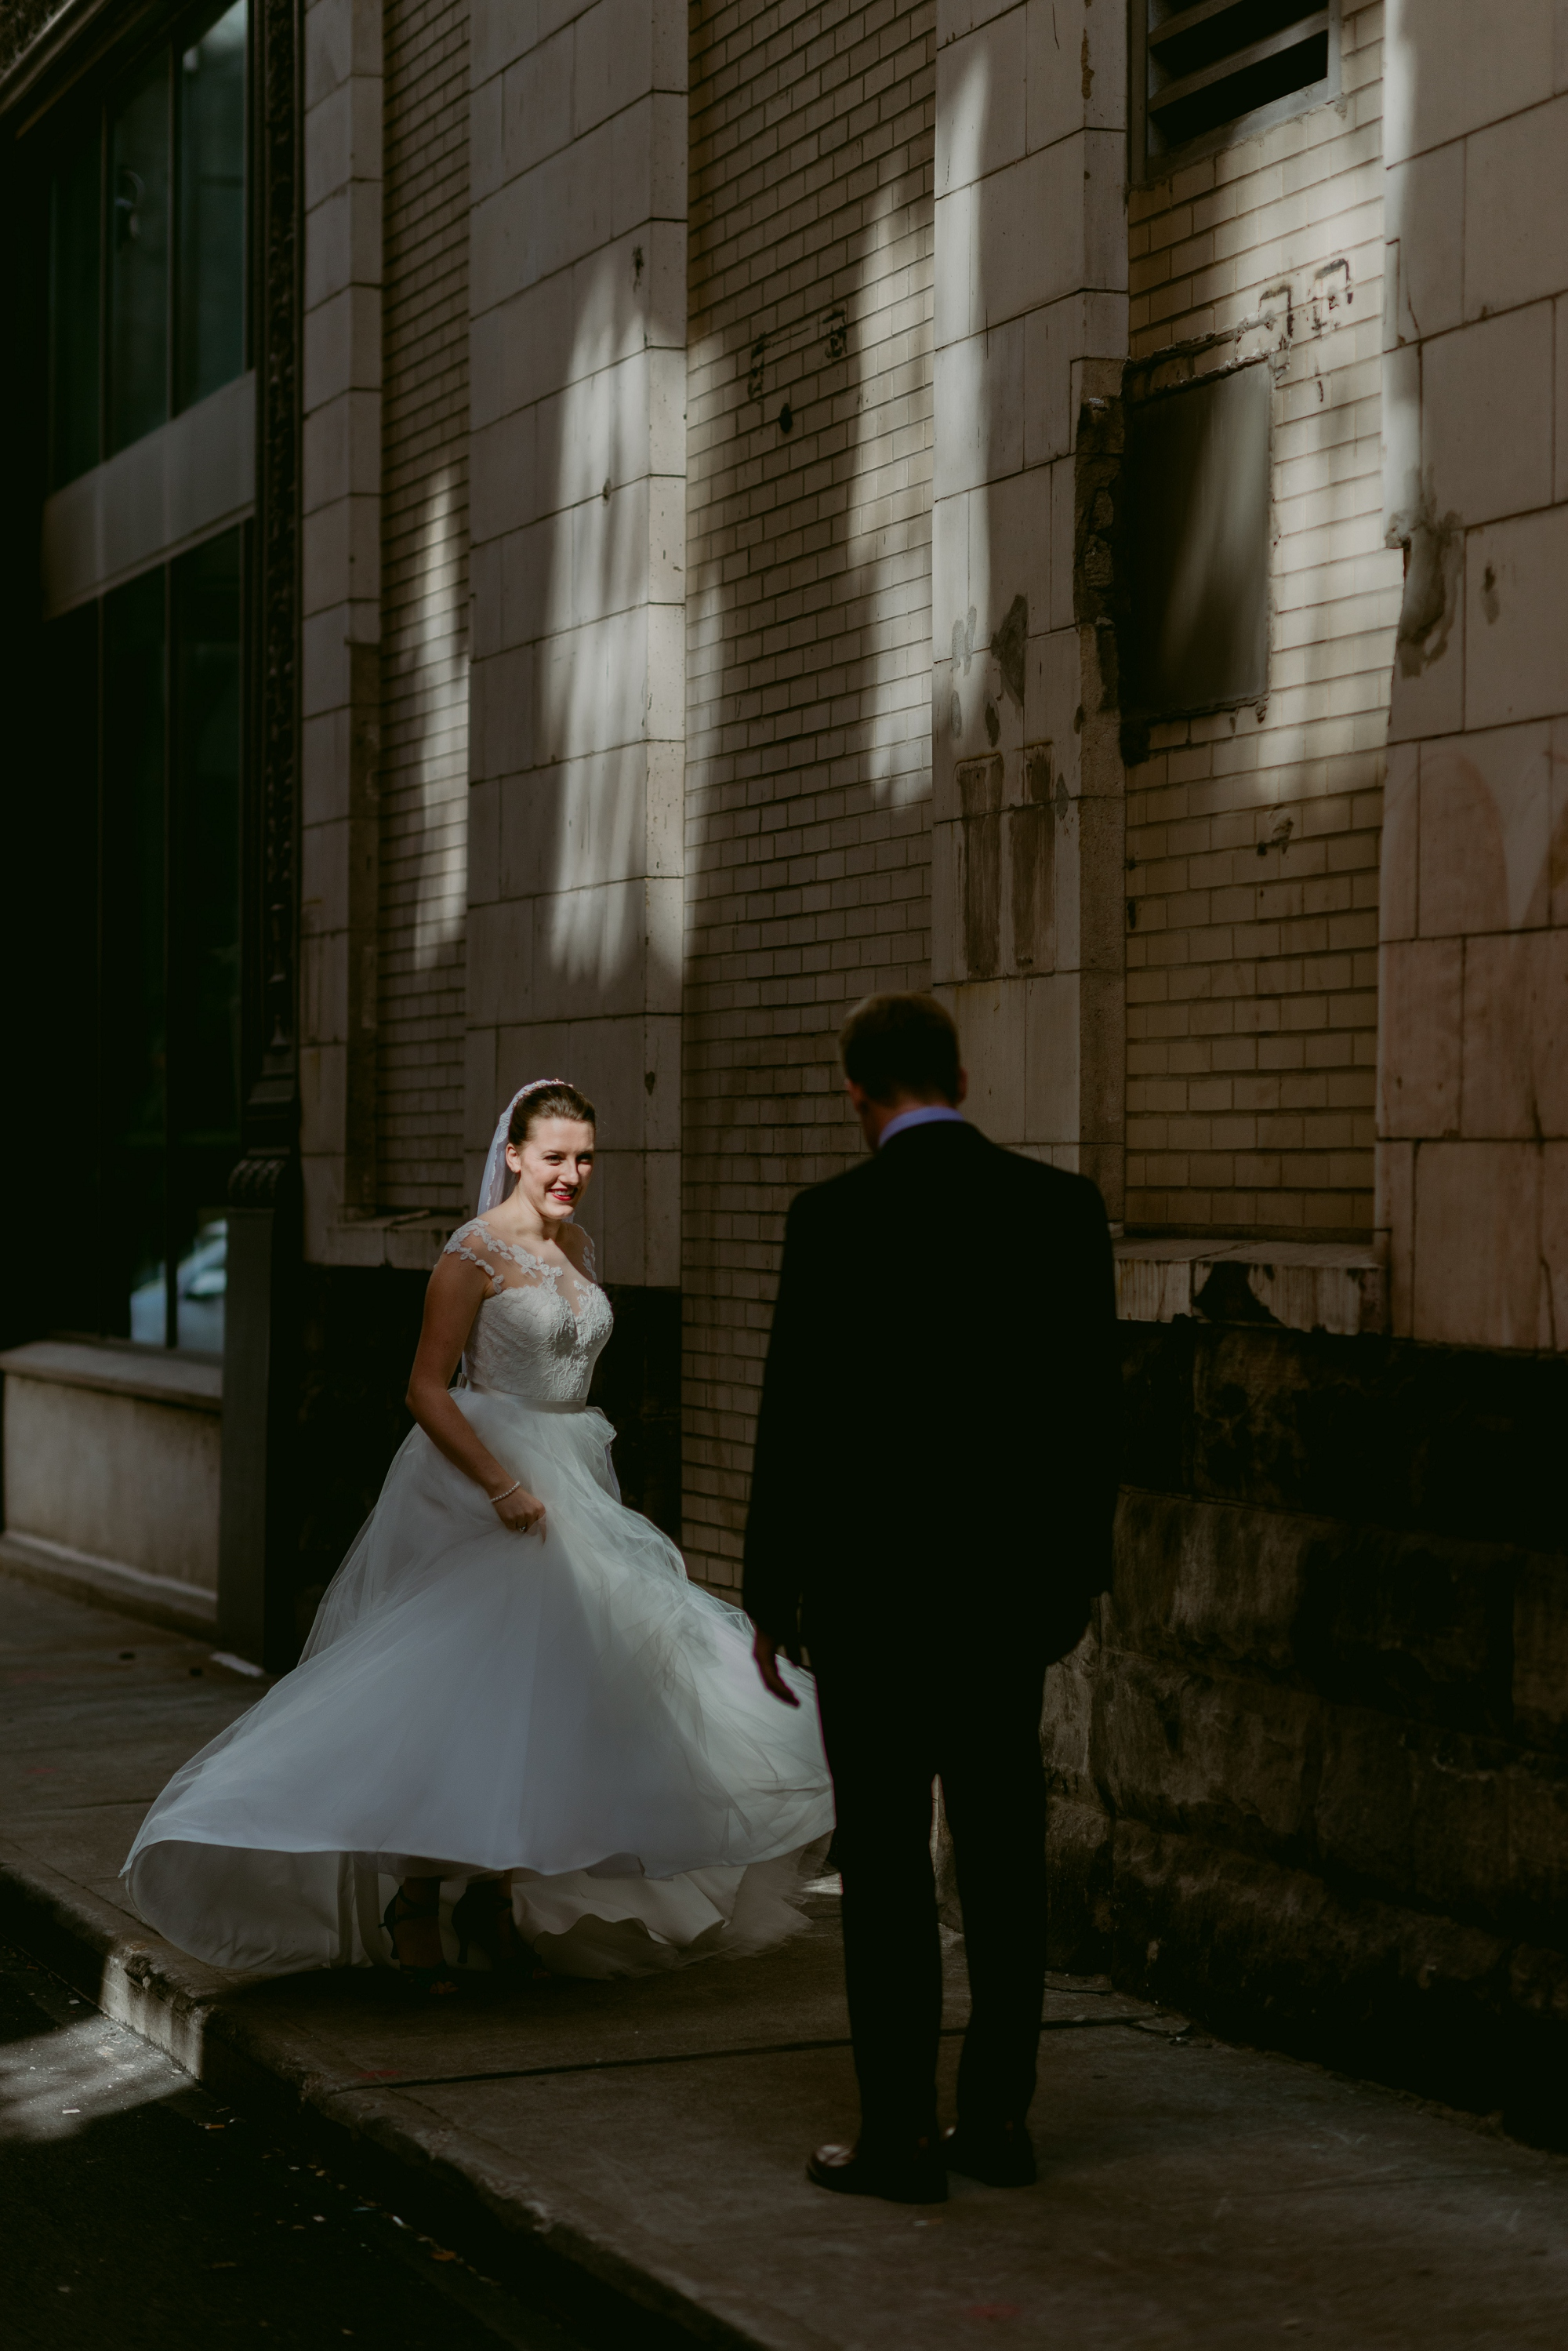 Romantic-Industrial-Warehouse-Wedding_Mallory+Justin-Photographers_0173.jpg